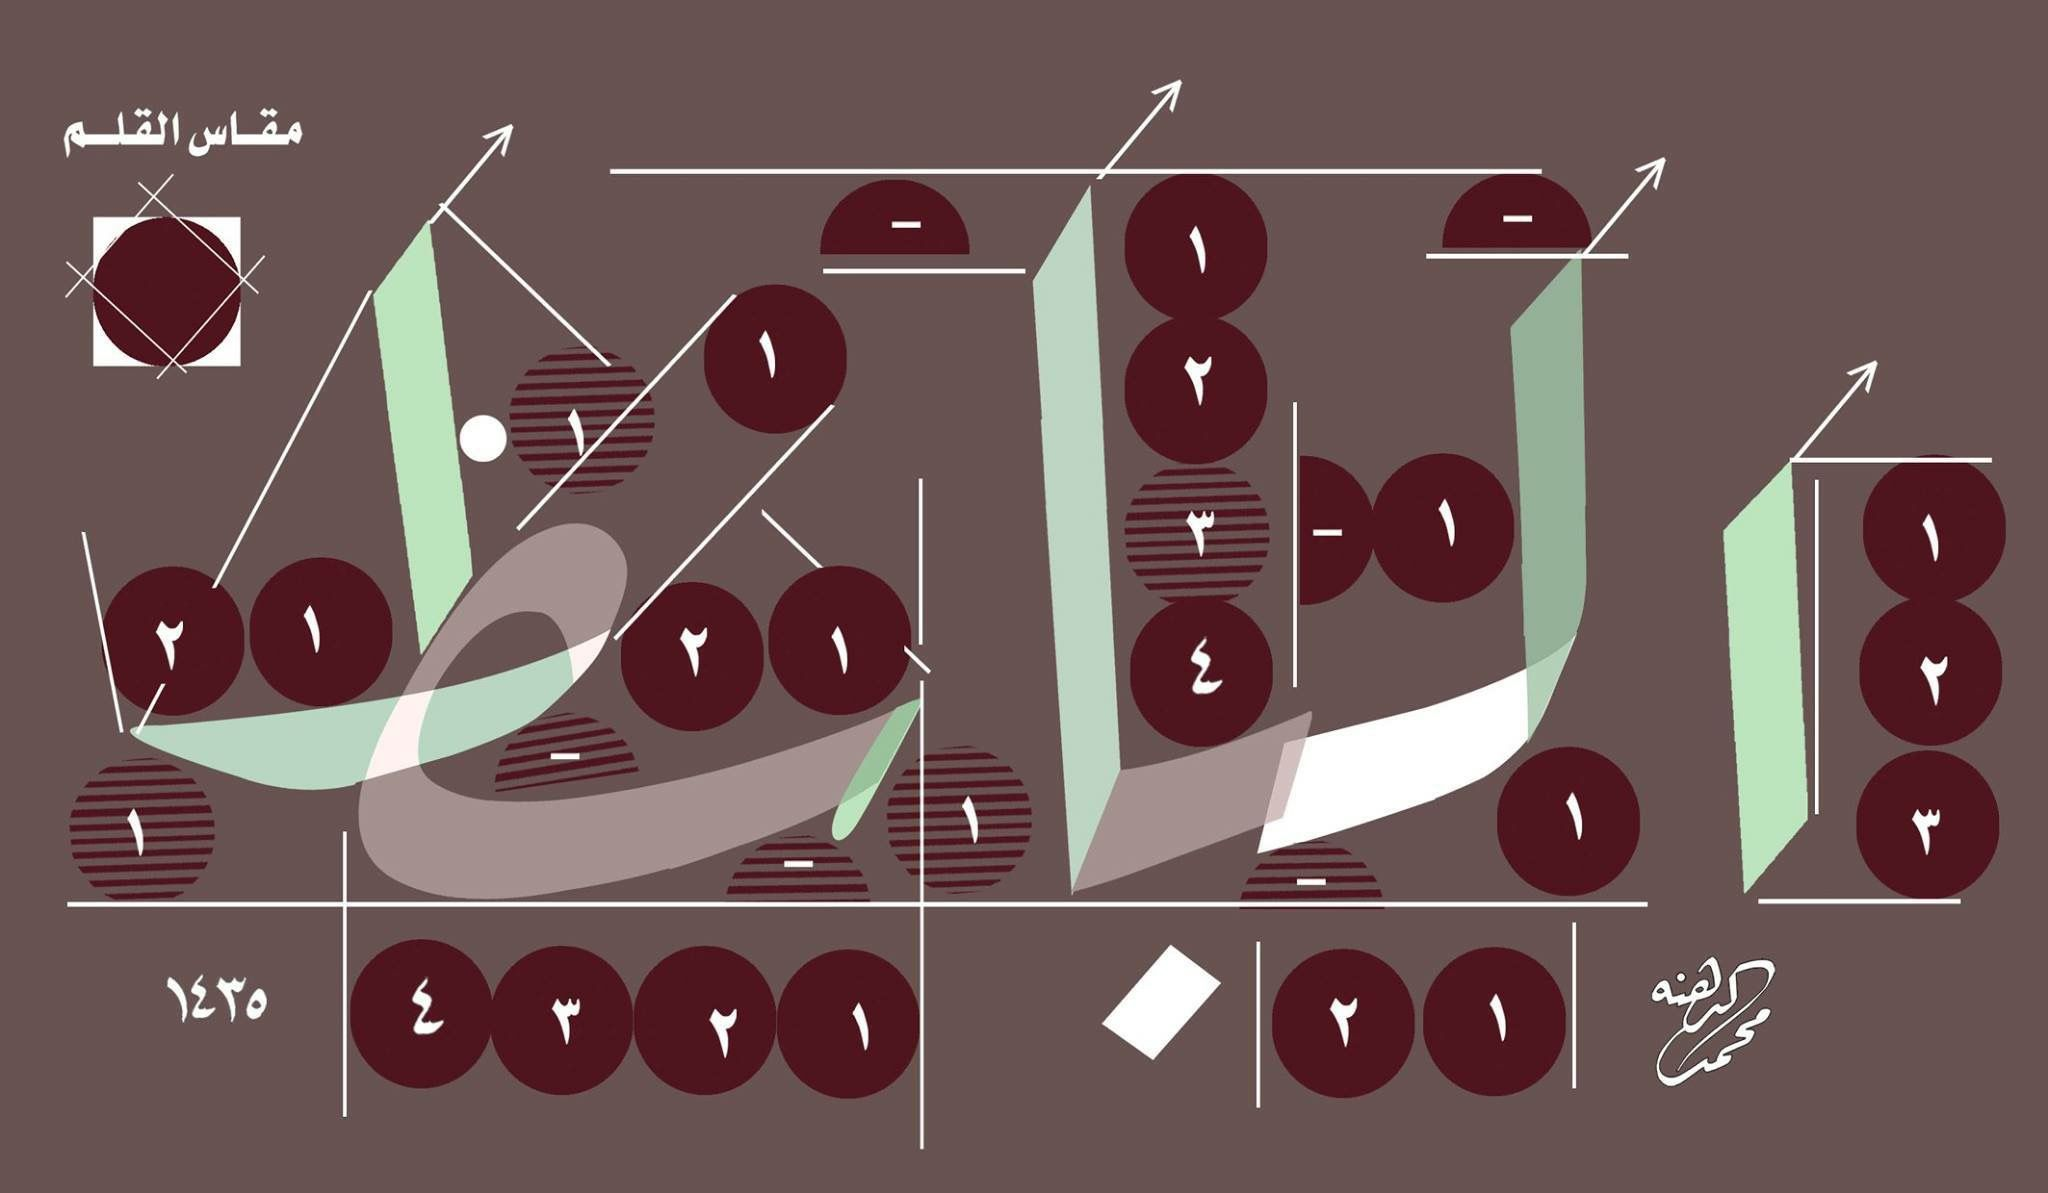 Pin By Yasser On أسماء الله الحسنى تجميعات Arabic Calligraphy Calligraphy Arabic